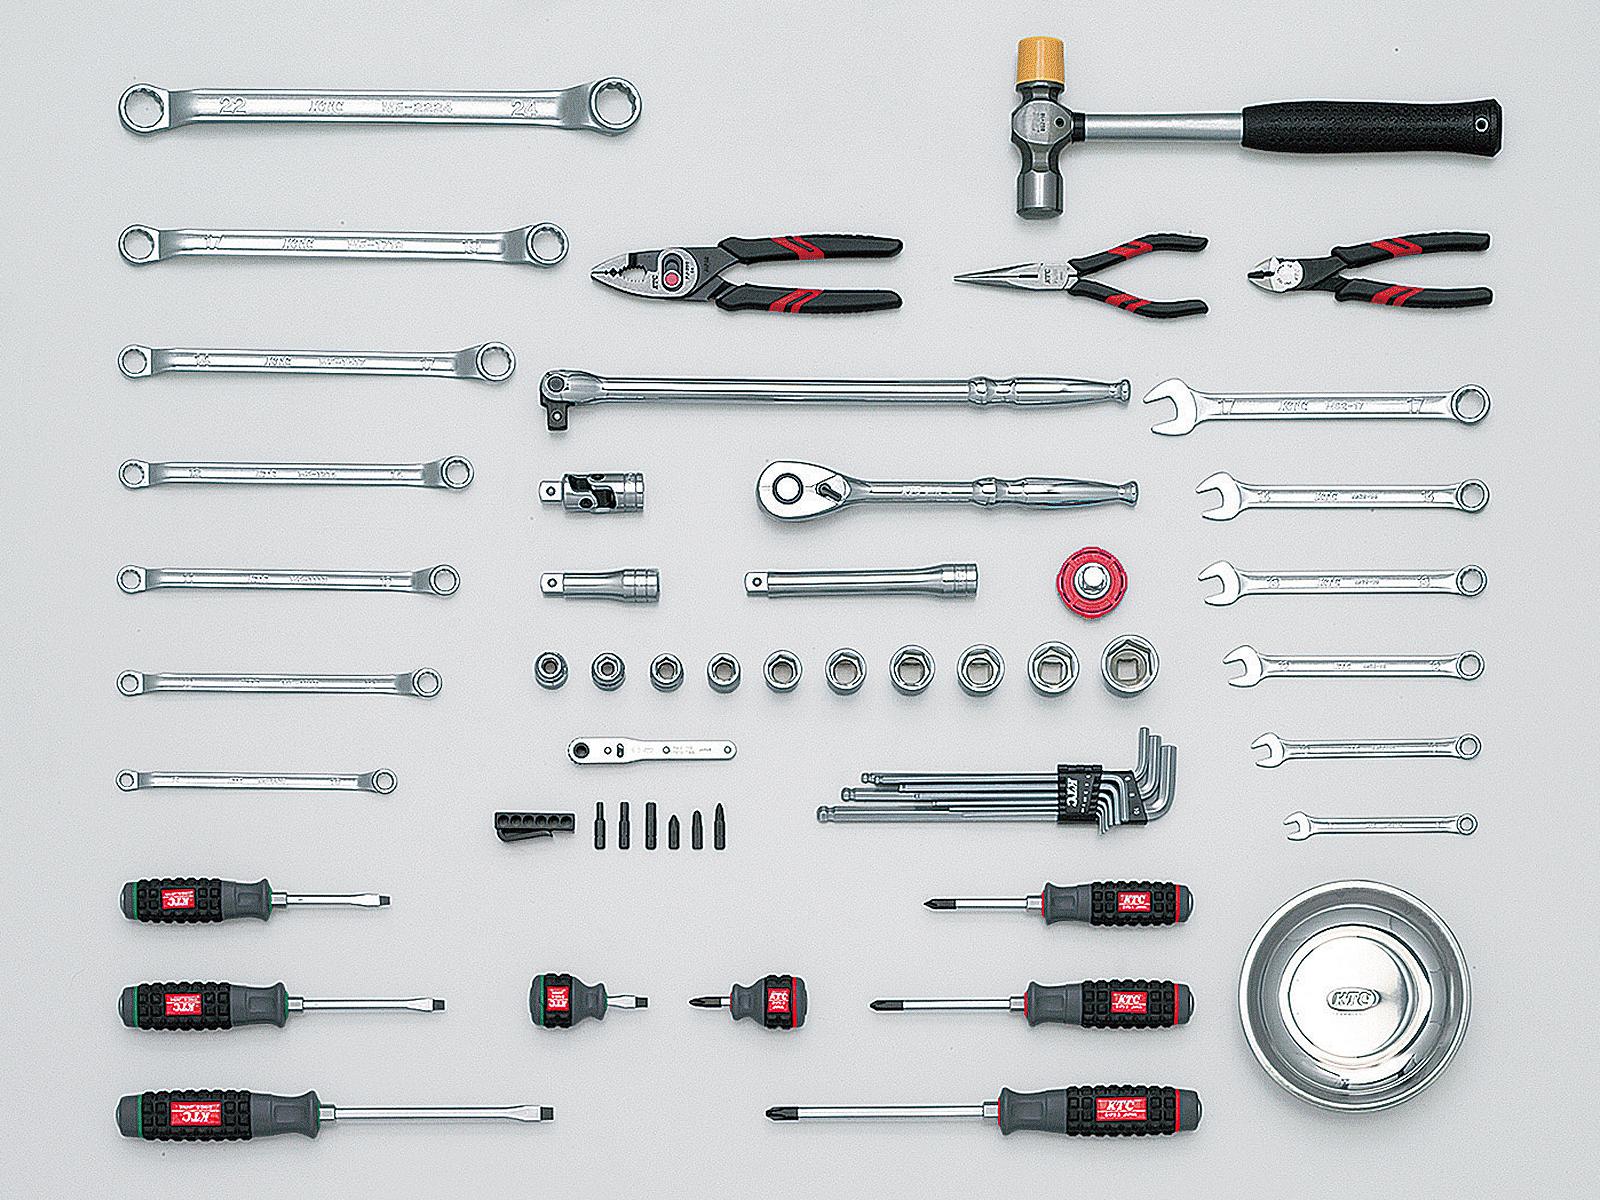 KTC 工具セット(チェストタイプ) 3737977 京都機械工具 最安値: 立春